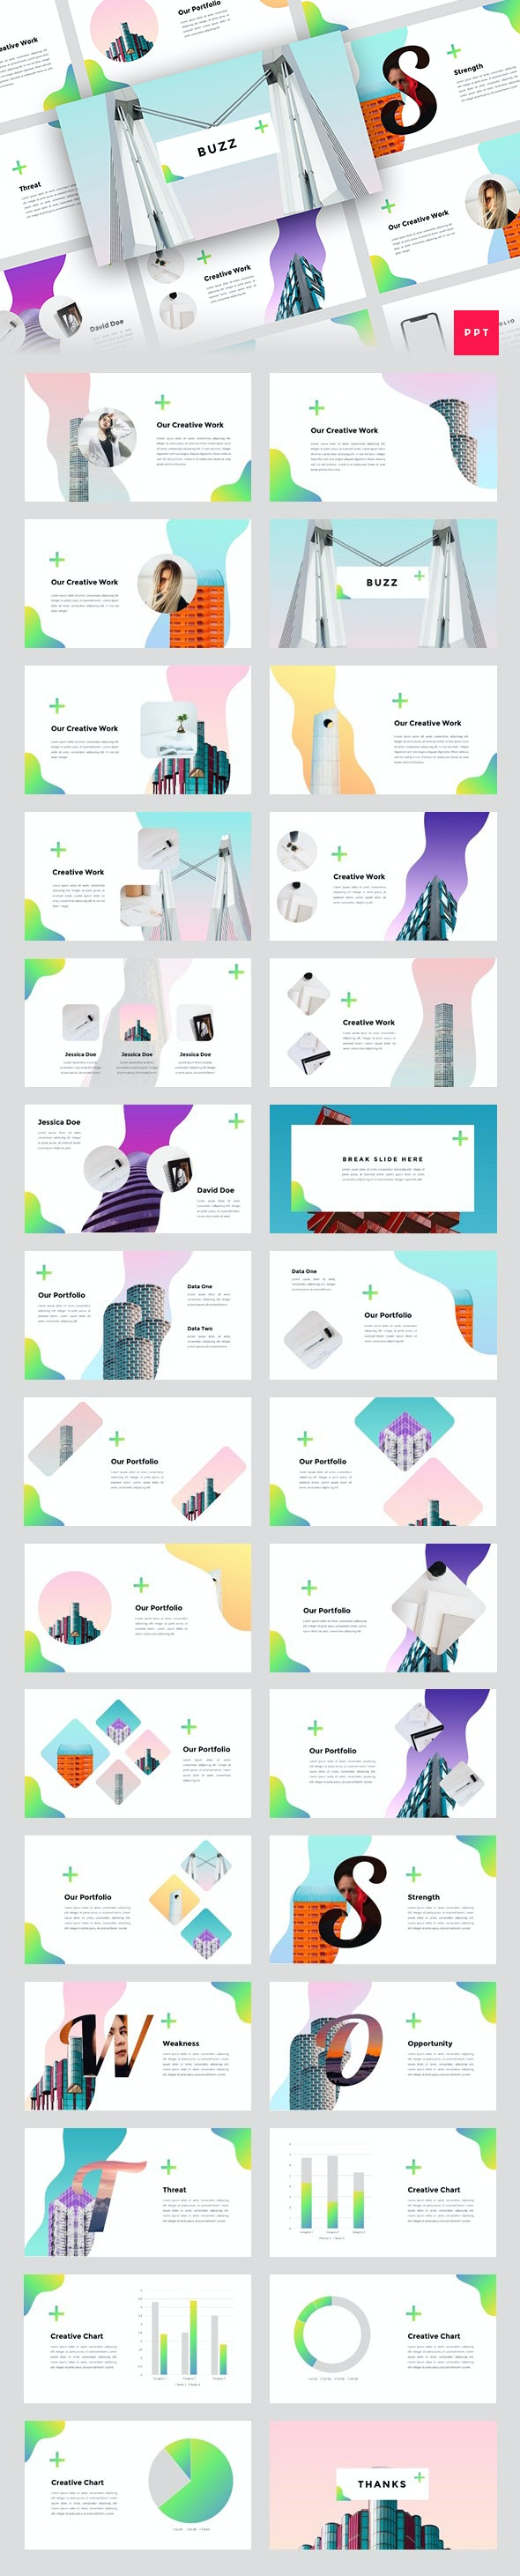 Buzz - Creative PowerPoint Template - Creative PowerPoint Templates